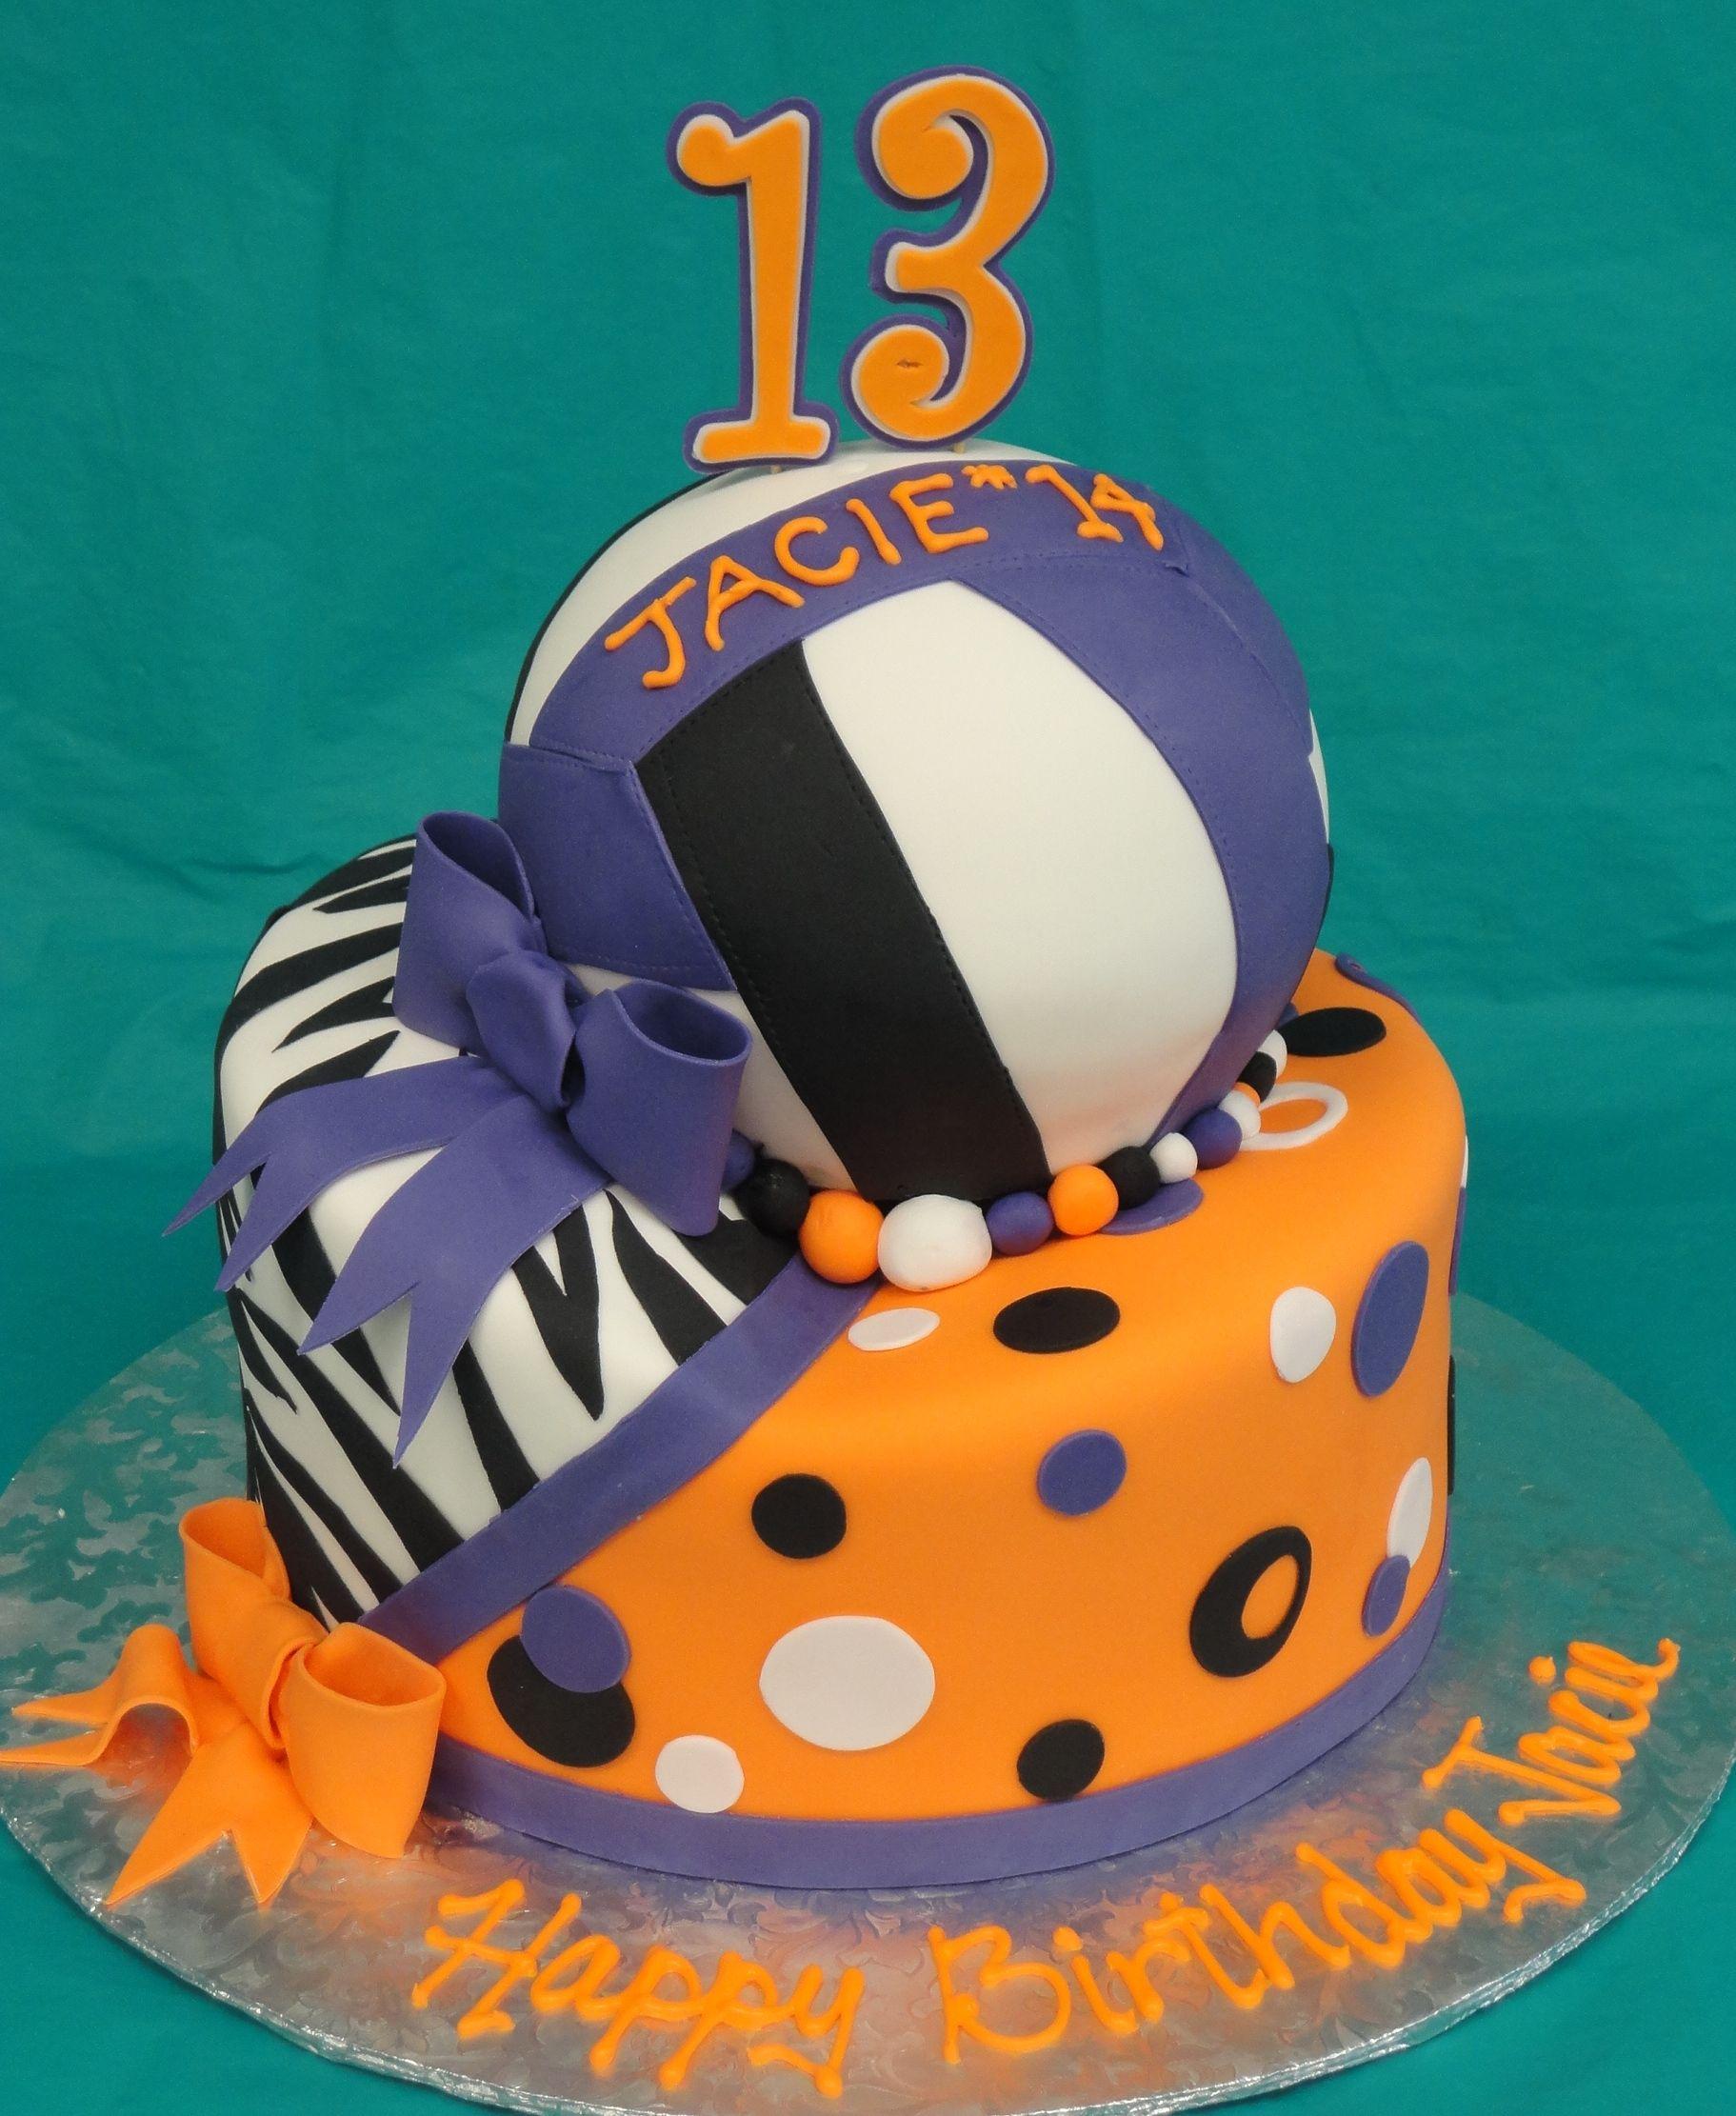 Pin By Dawn Saenz On Cakes Cakes Morecakes Volleyball Cakes Cake My Birthday Cake